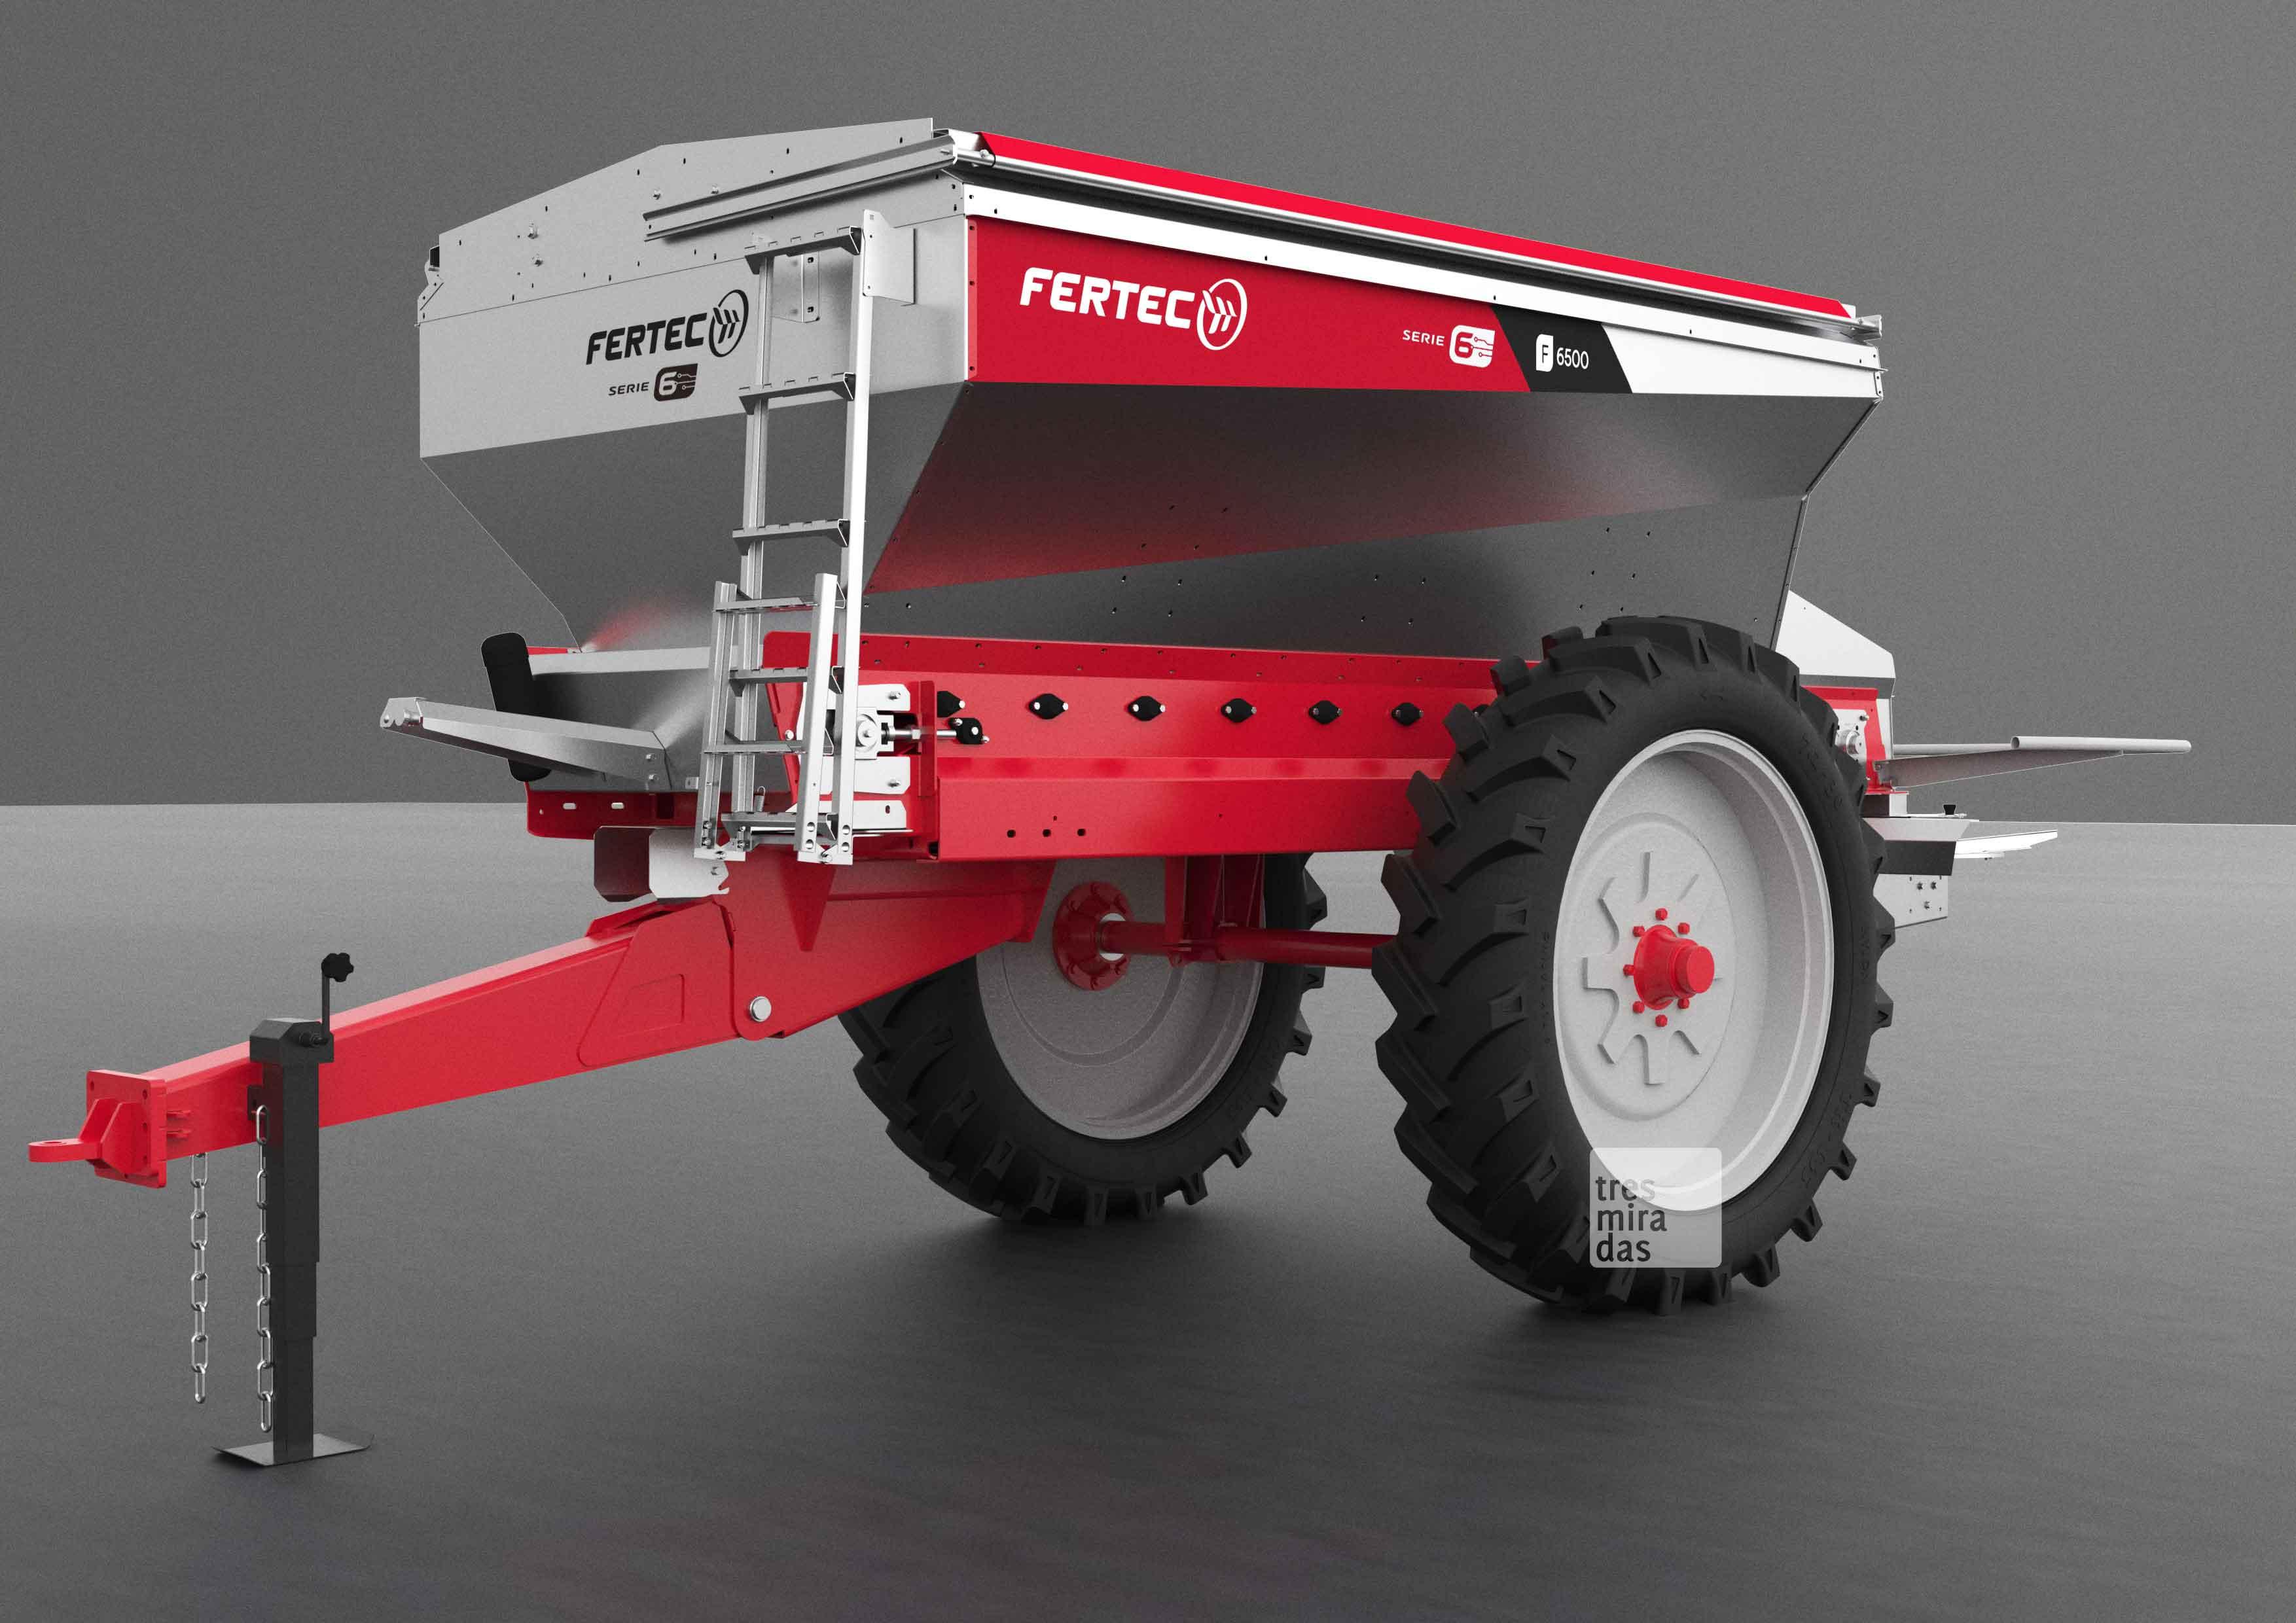 Fertec's new towed fertilising machine product render